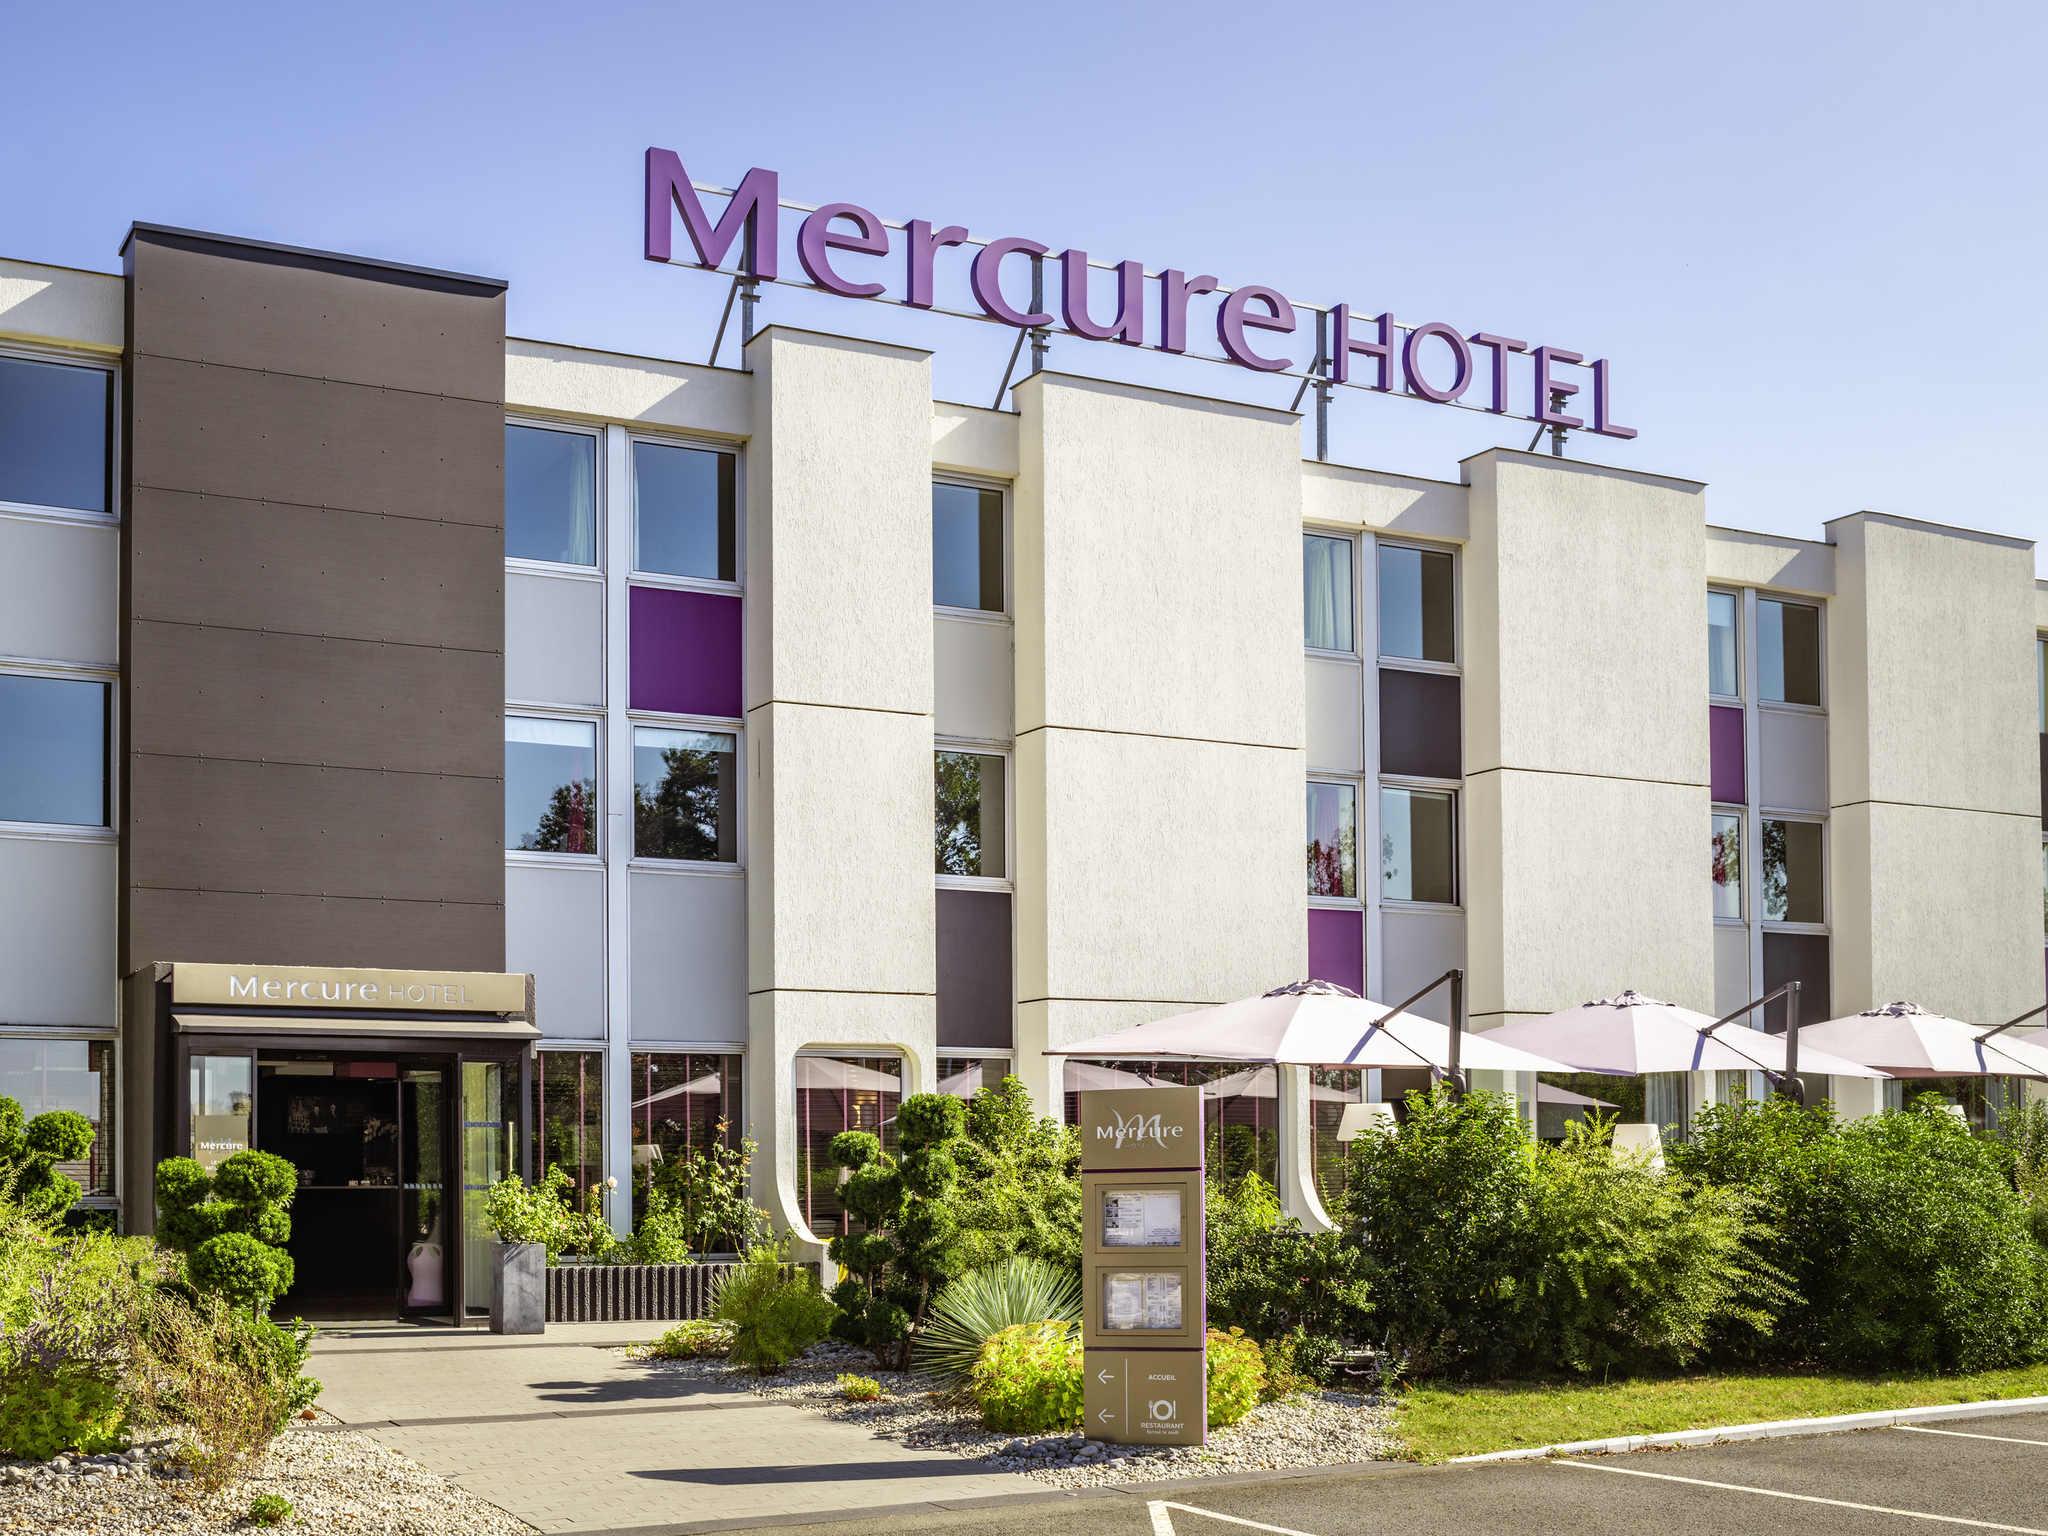 Hotel – Hotel Mercure Le Mans Batignolles